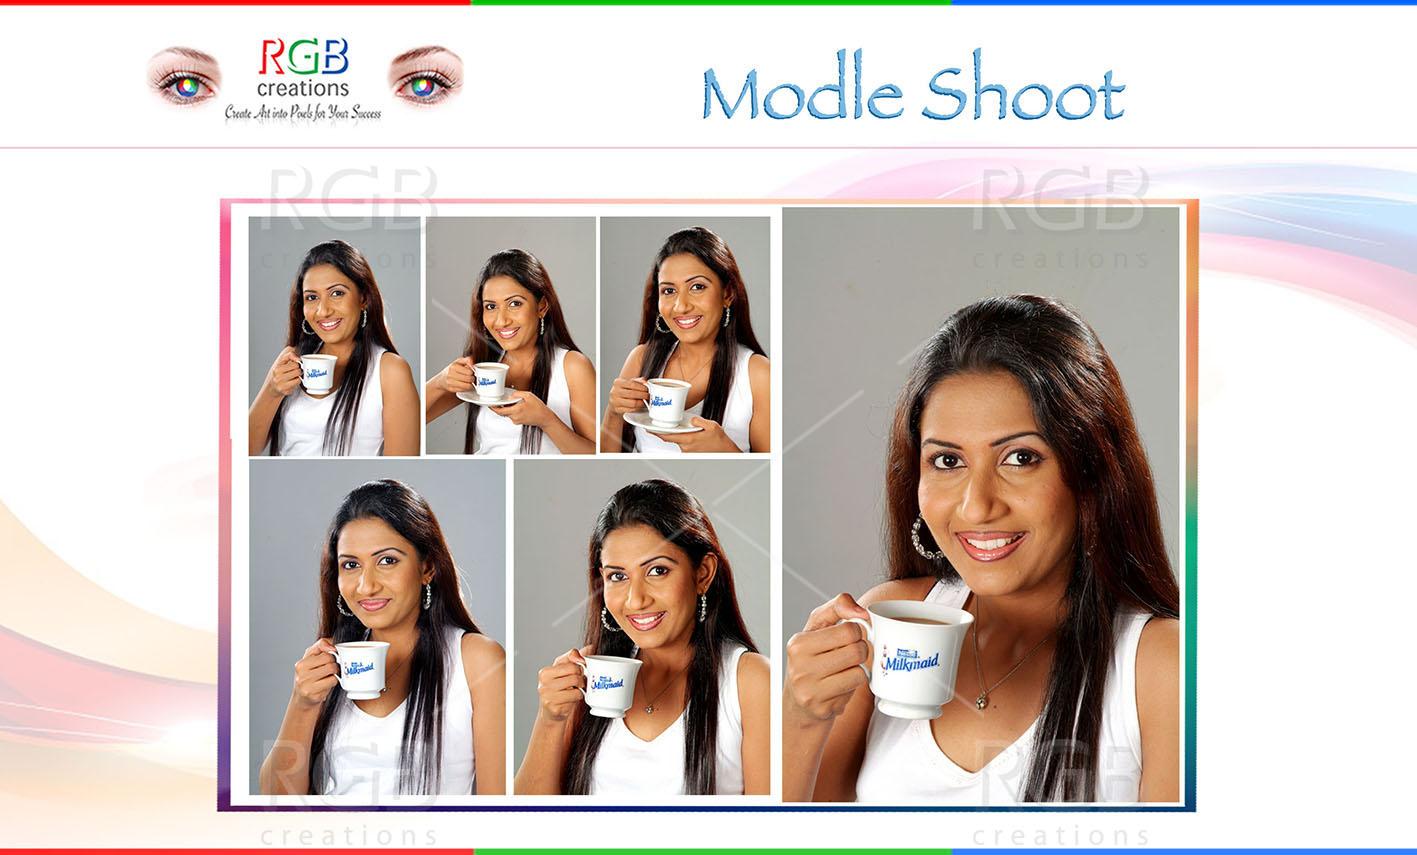 Milkmaid Modle Shoot